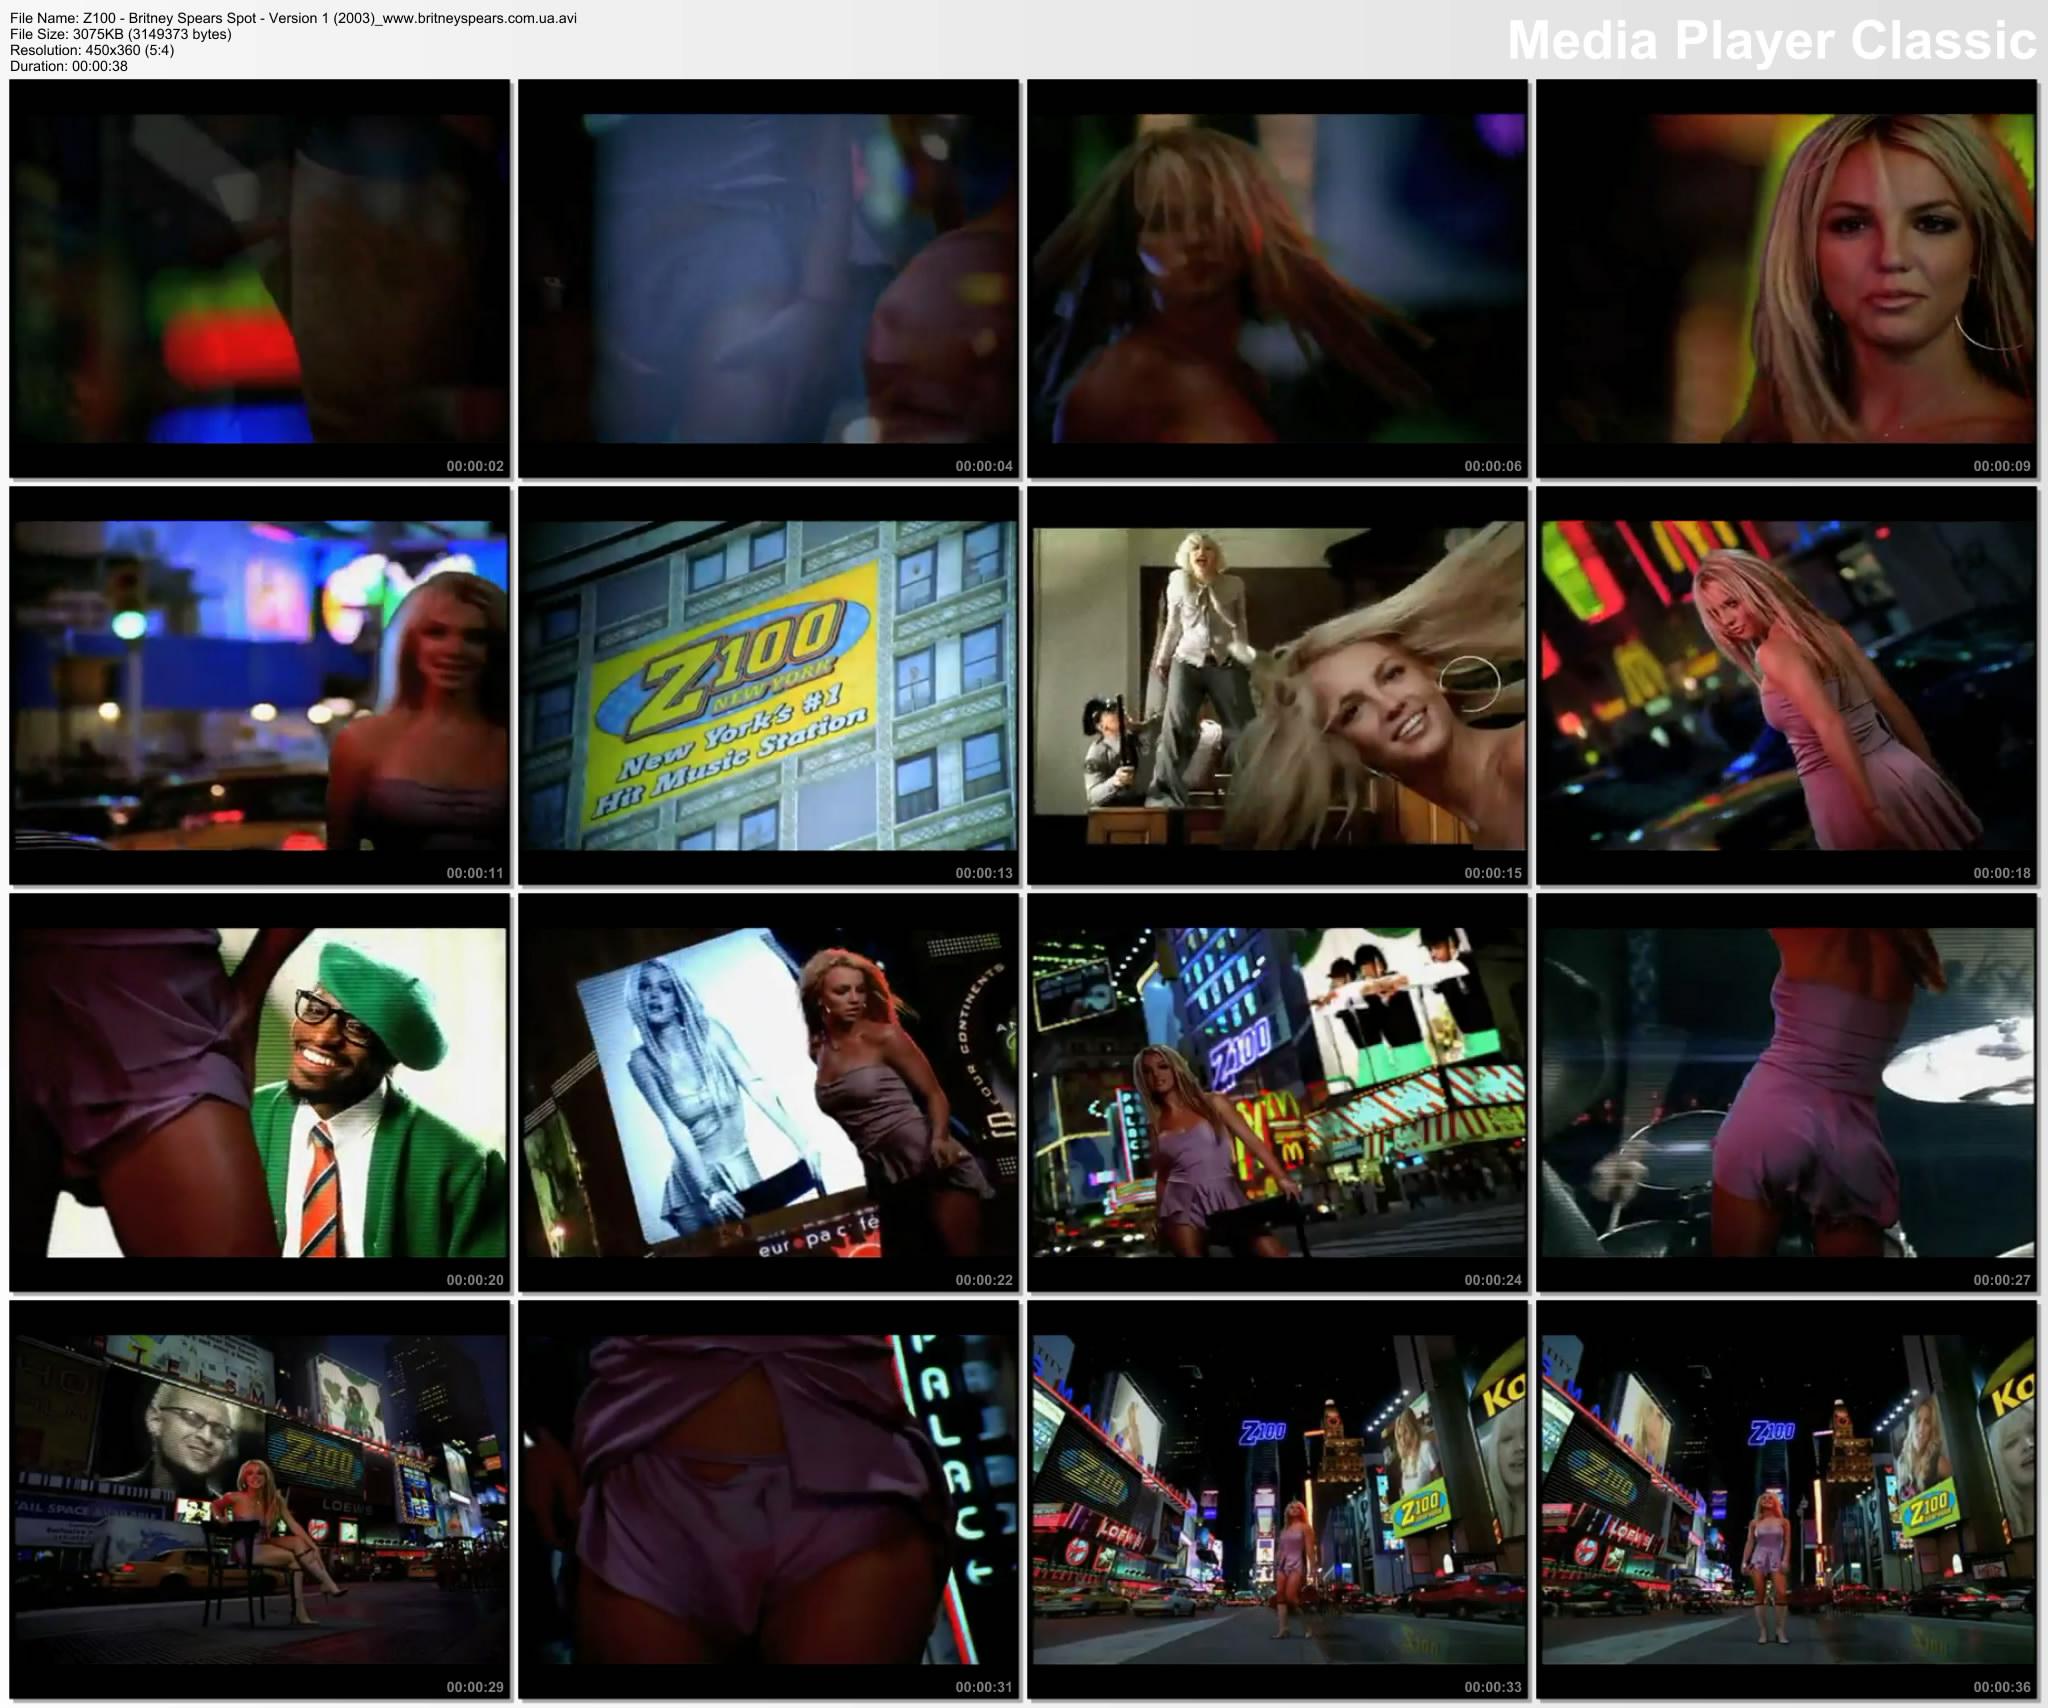 21864_Z100_BritneySpearsSpot_Version12003_www.britneyspears.com.ua.avi_thumbs_2010.05.02_20.25.09_122_93lo.jpg